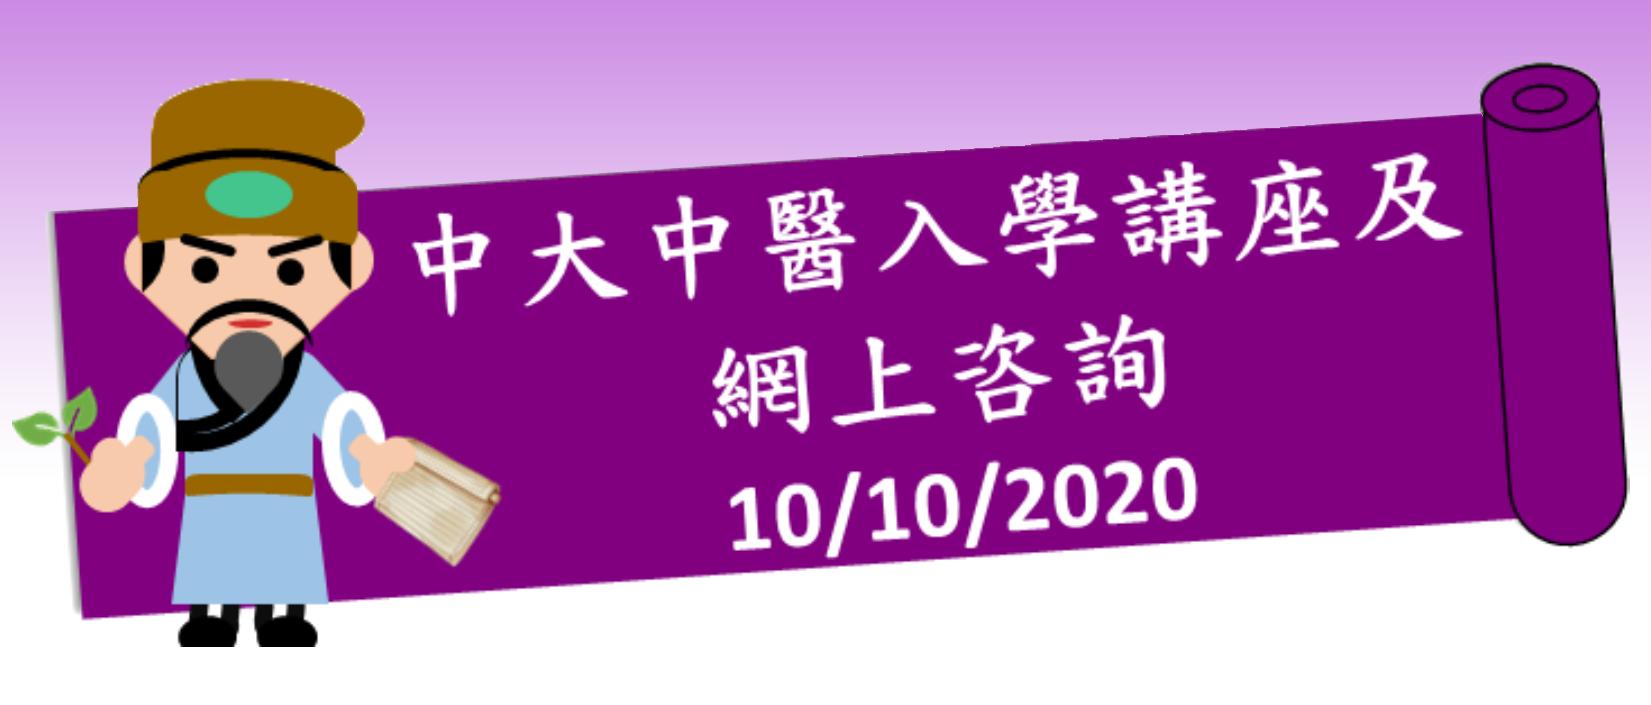 V-info-day-banner-1651x705px-1